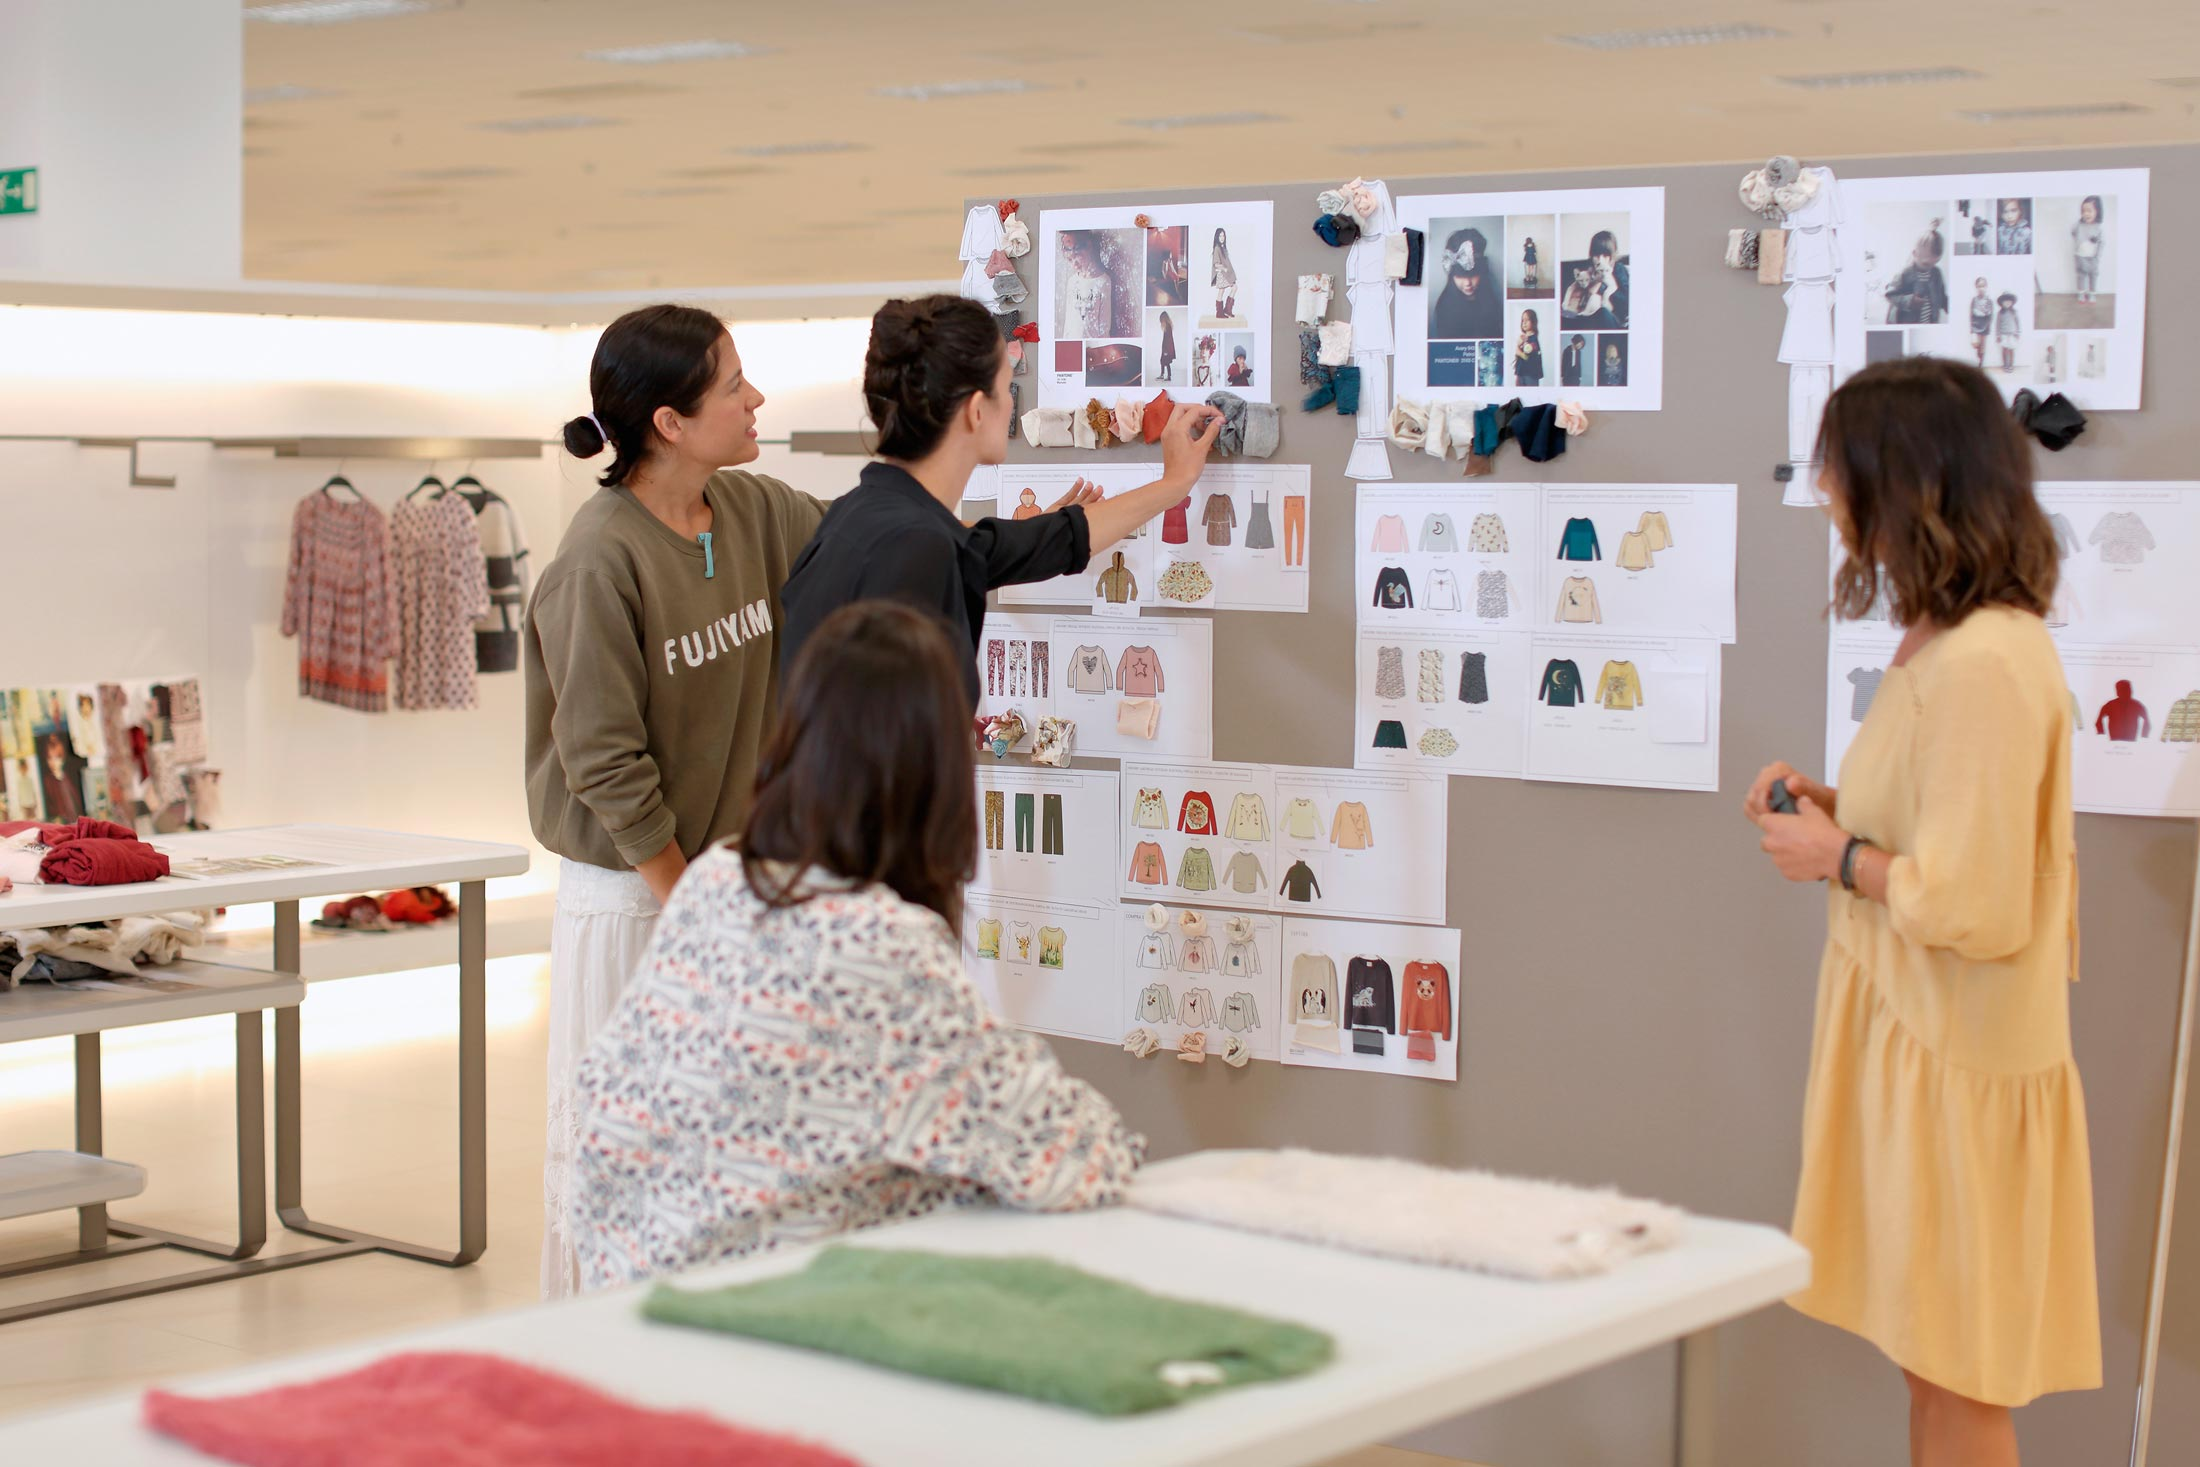 Zara's Recipe for Success: More Data, Fewer Bosses - Bloomberg